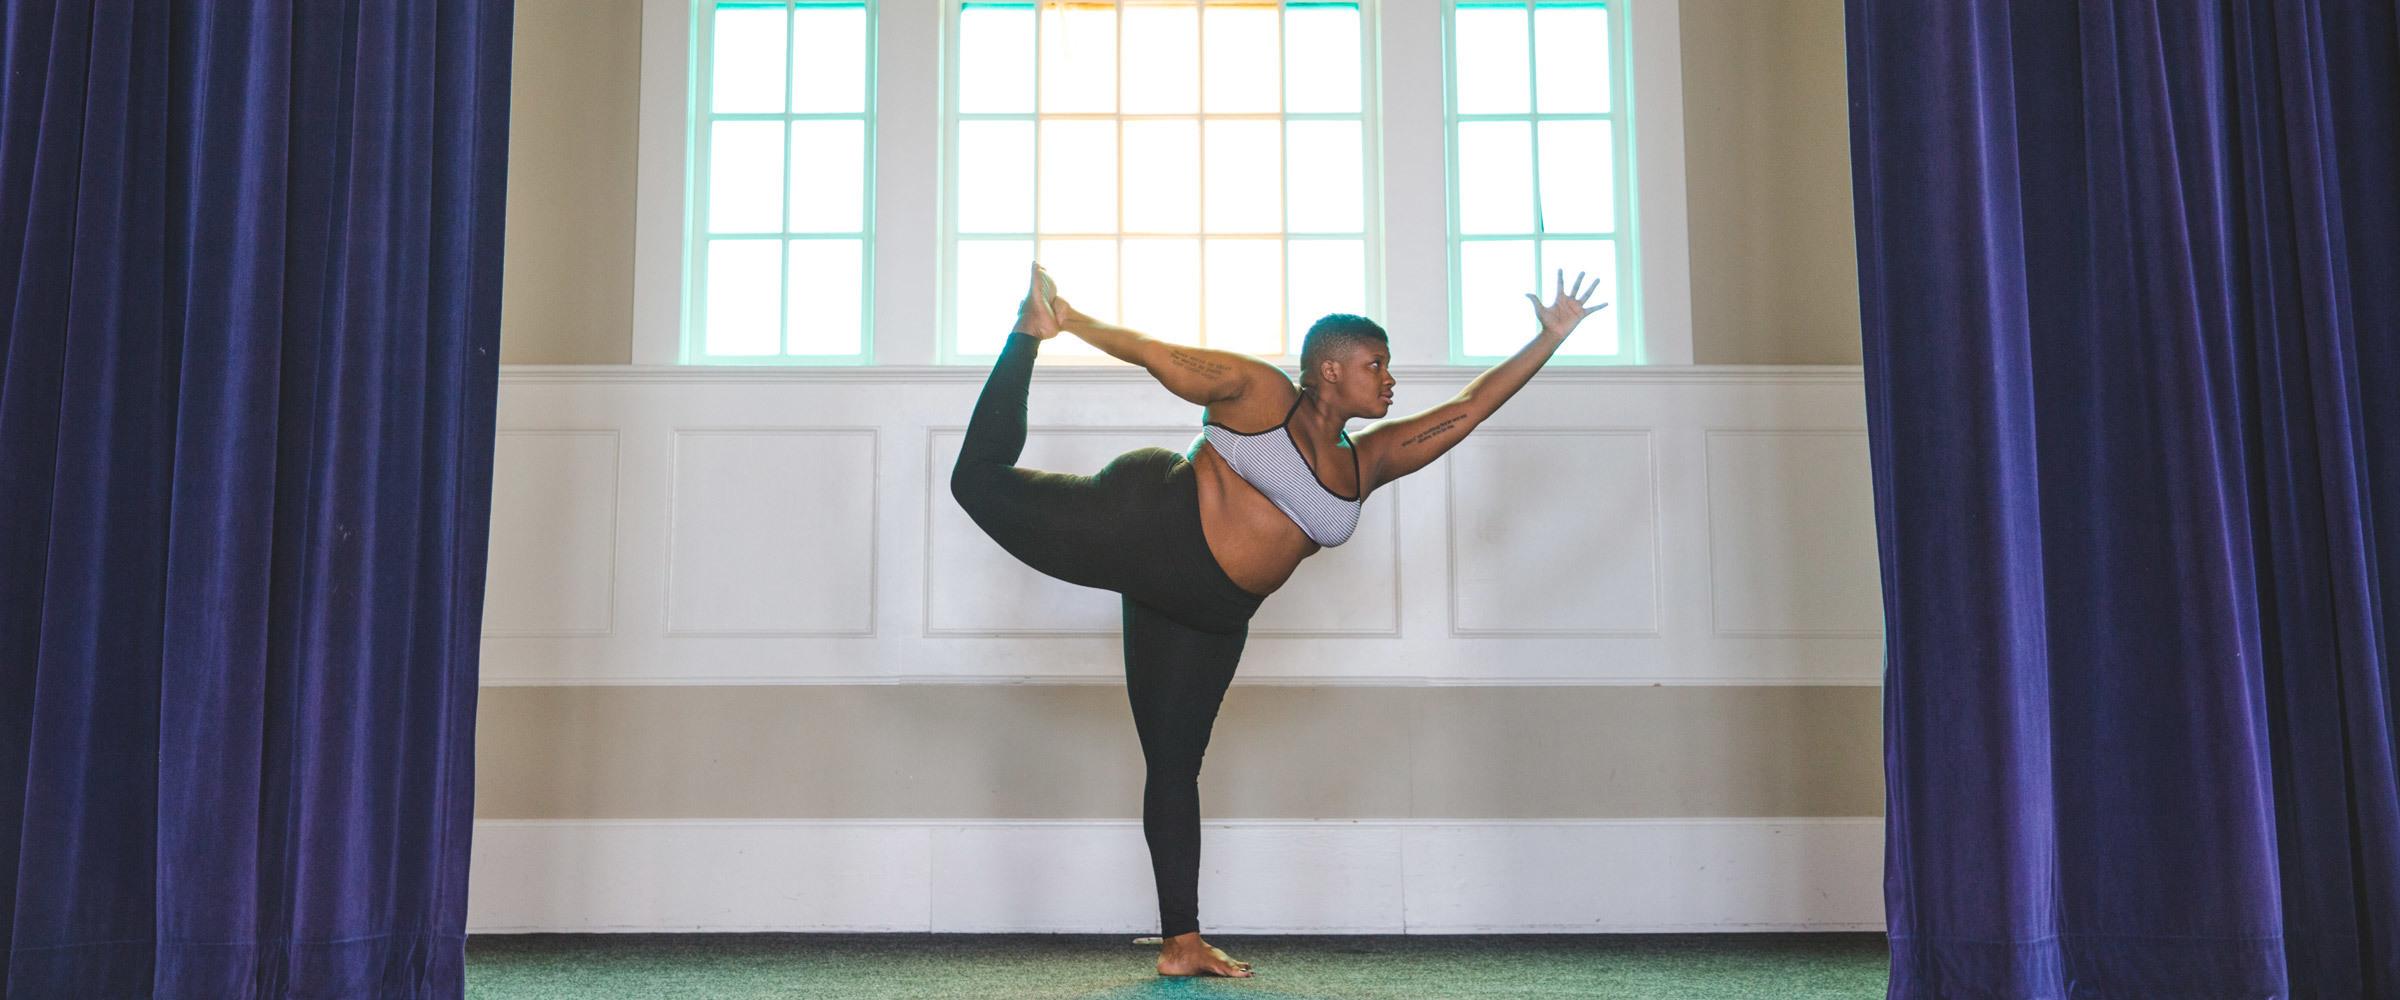 Patrick and carling yoga dating 4